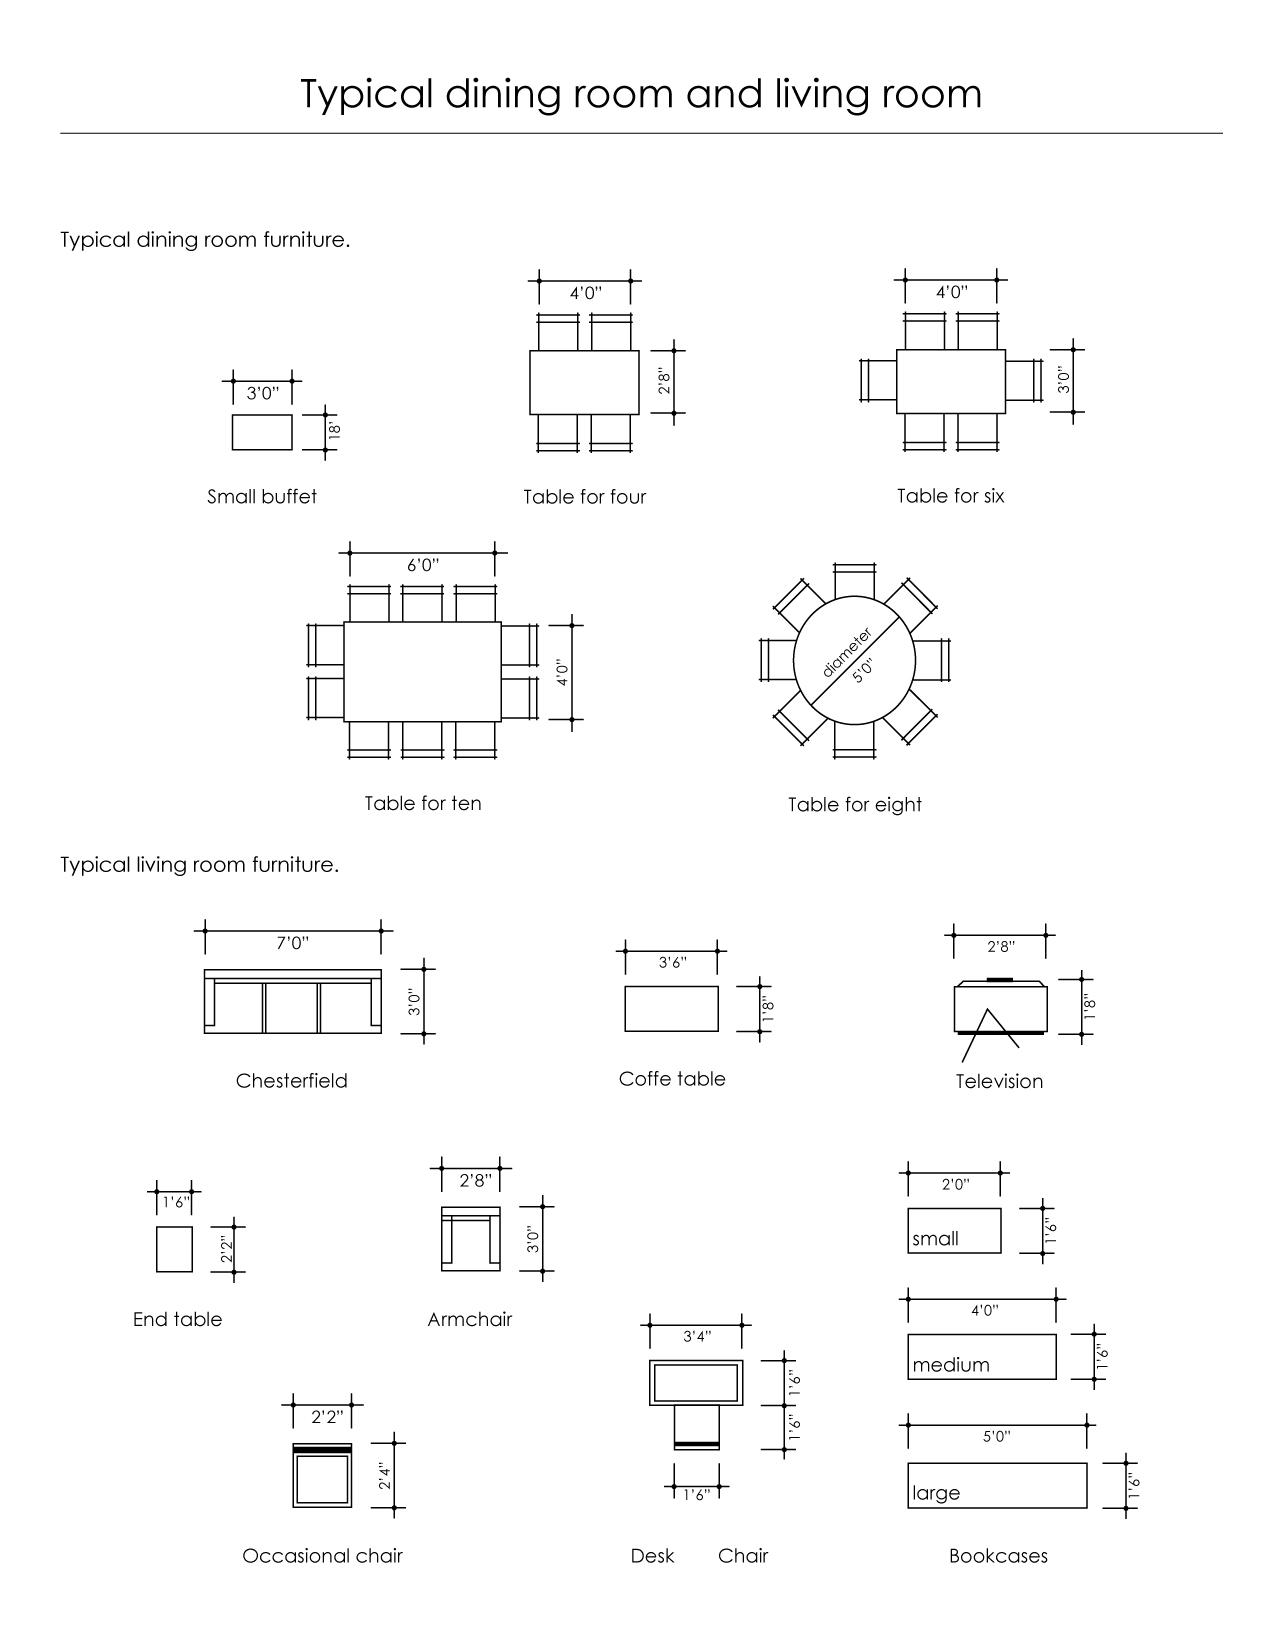 wiring diagram for modular furniture jorge kurczyn - gallery furniture measurement diagram #2